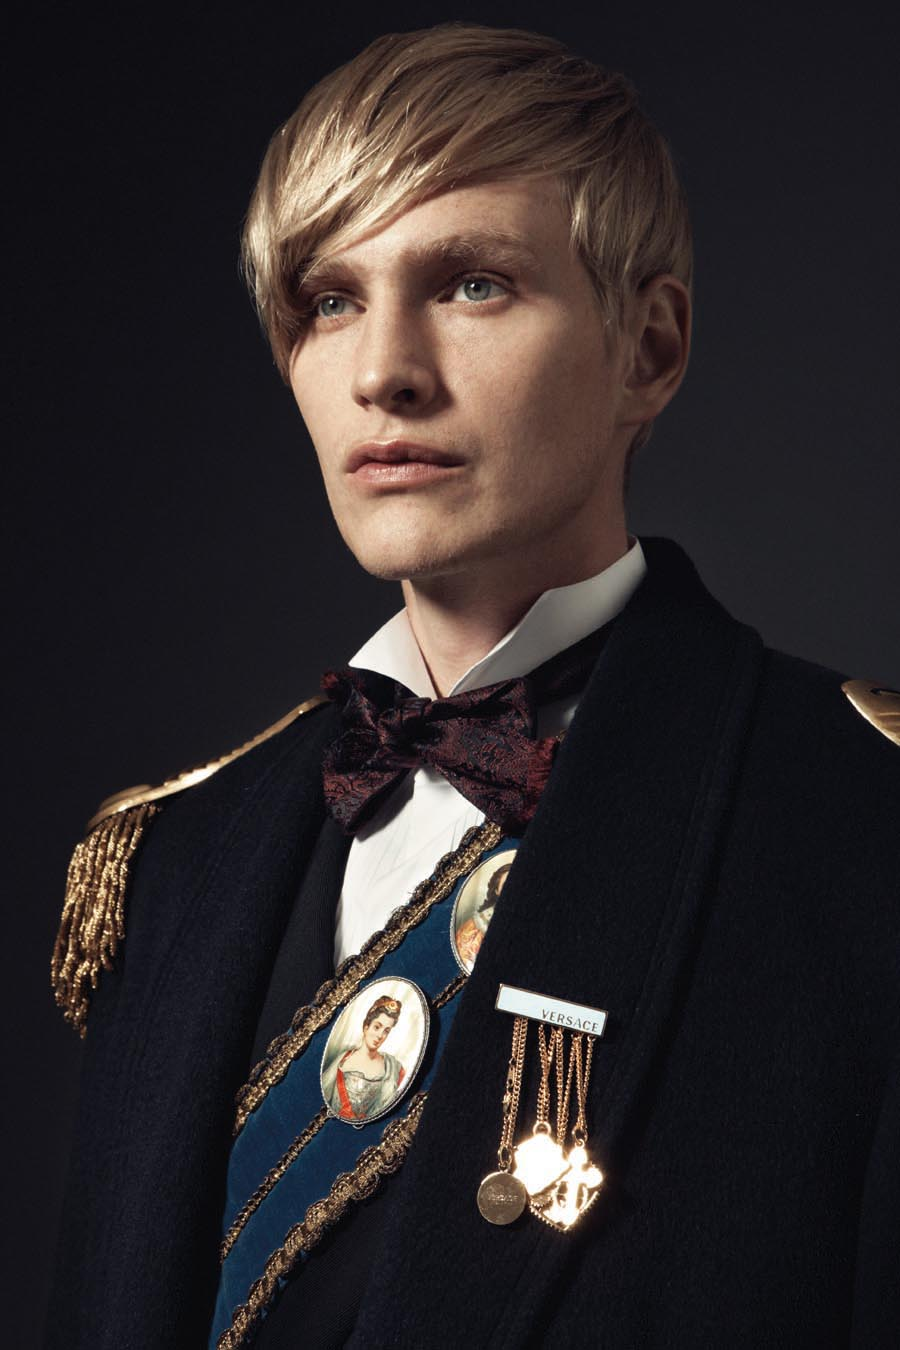 Gerhard Freidl0323_VIKTOR Magazine_Ph Adriano Russo(Wiener Models)